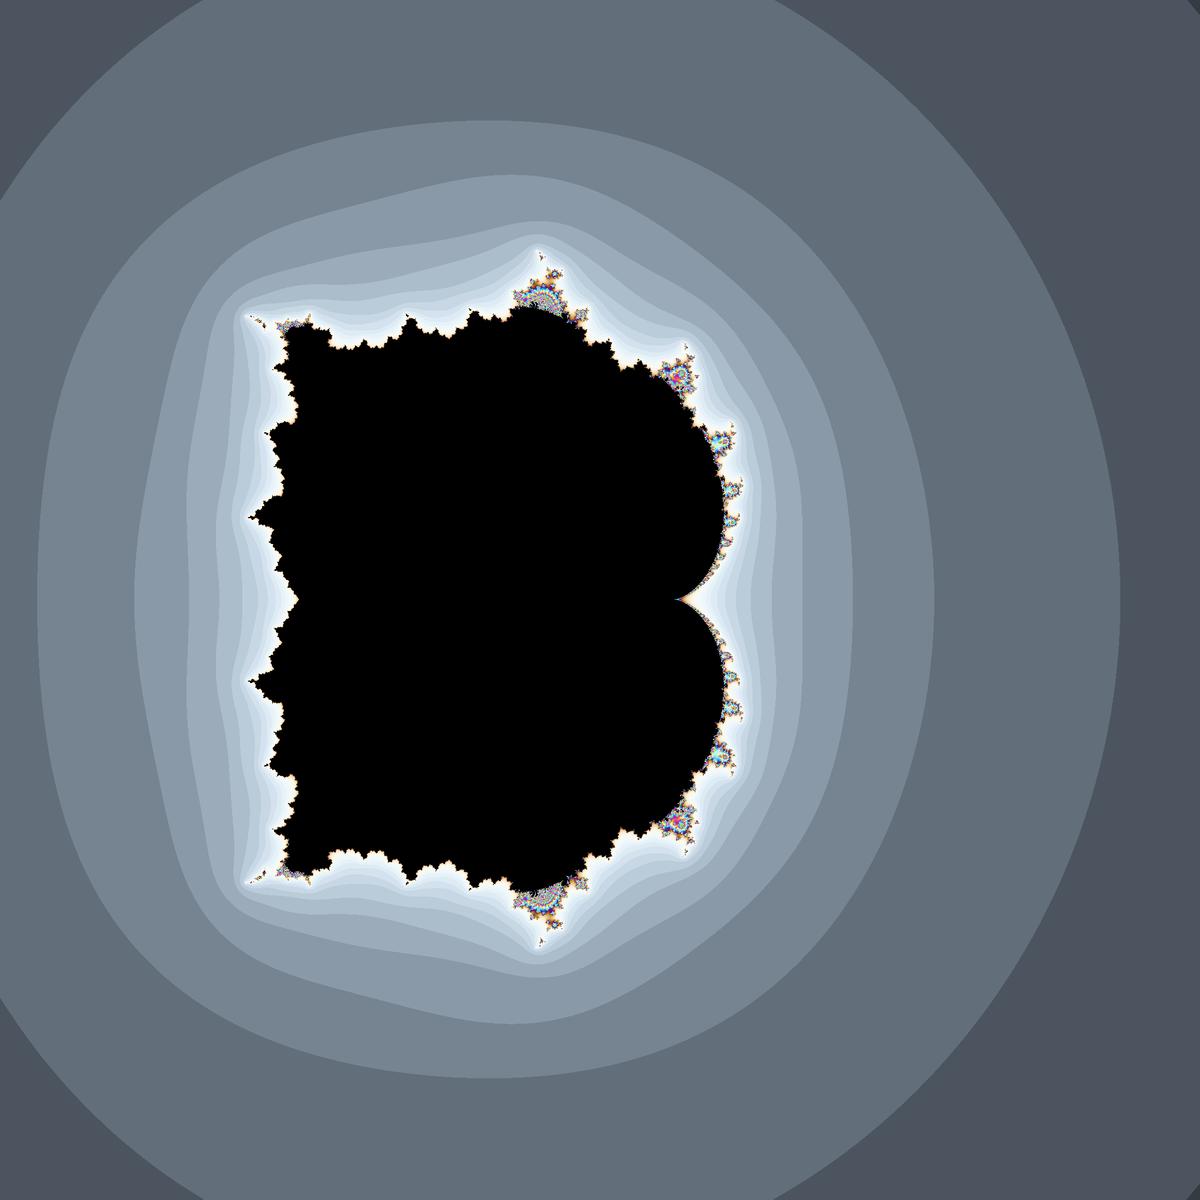 f:id:Hassium277:20210330211919p:plain